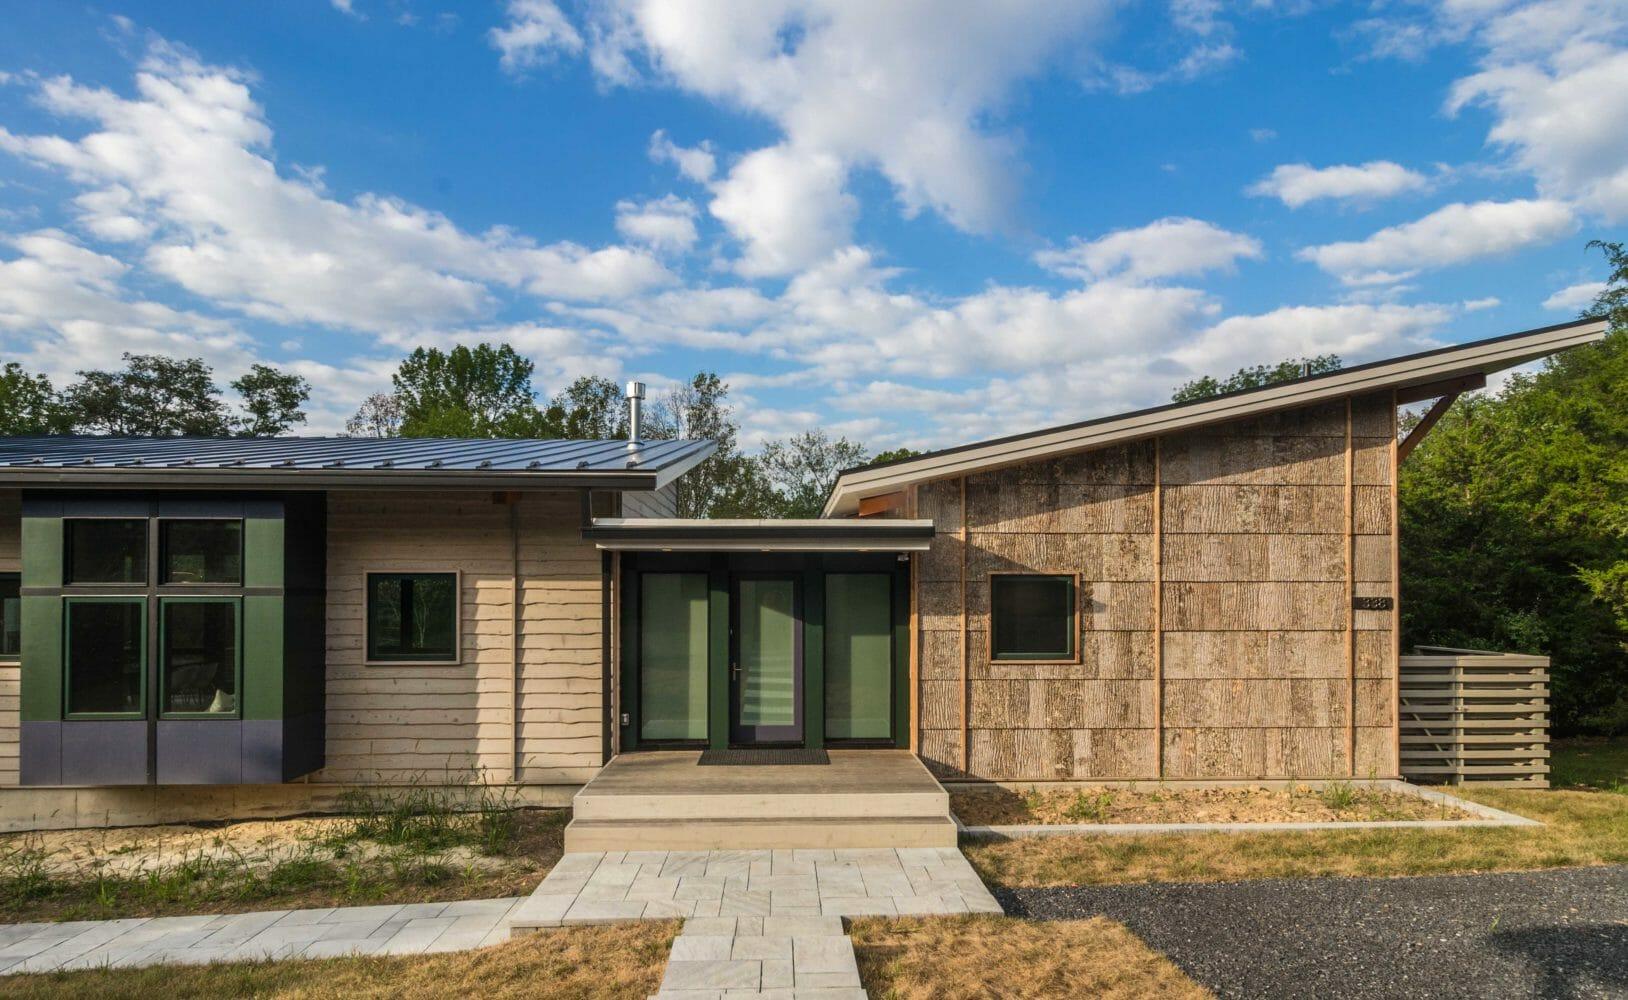 bark-house-exterior-poplar-bark-siding-Camusrory-01